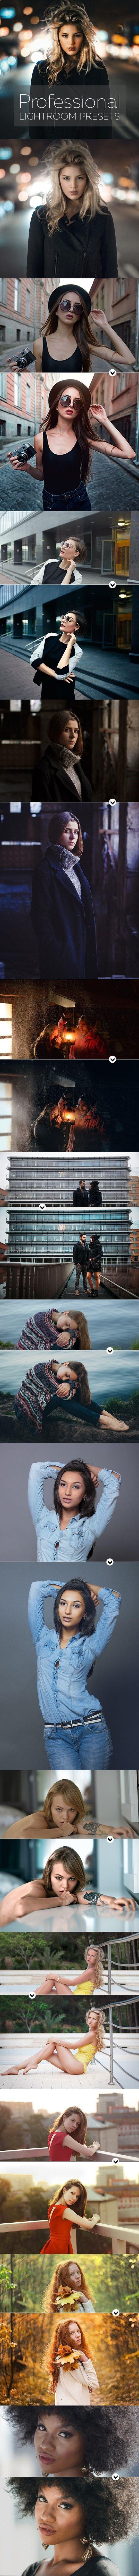 43 Premium Lightroom Presets #photography Download: graphicriver.net/...